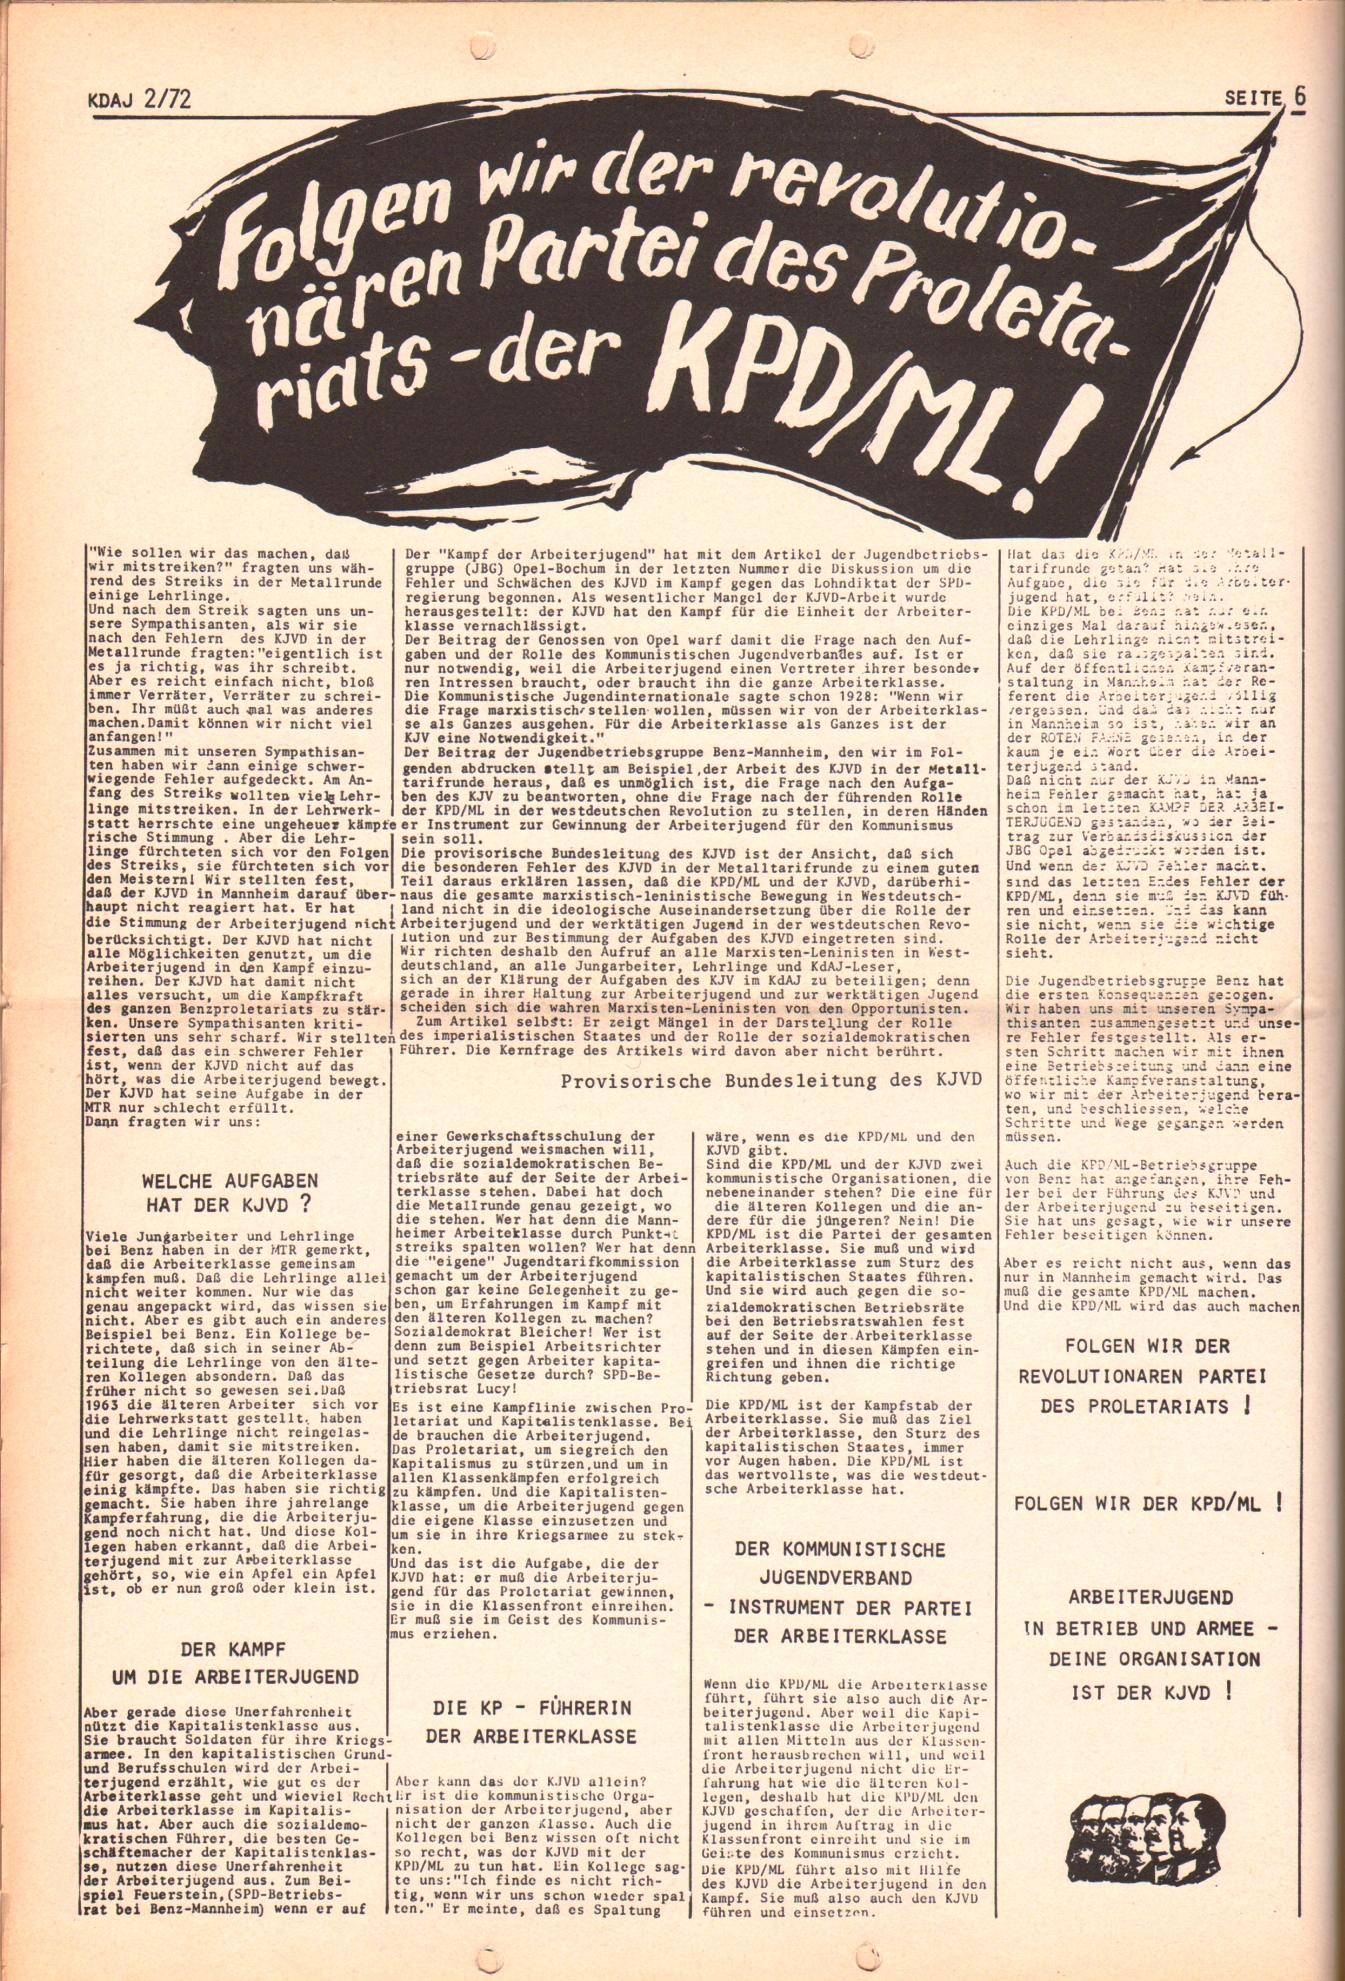 KDAJ, 3. Jg., März 1972, Nr. 2, Seite 6